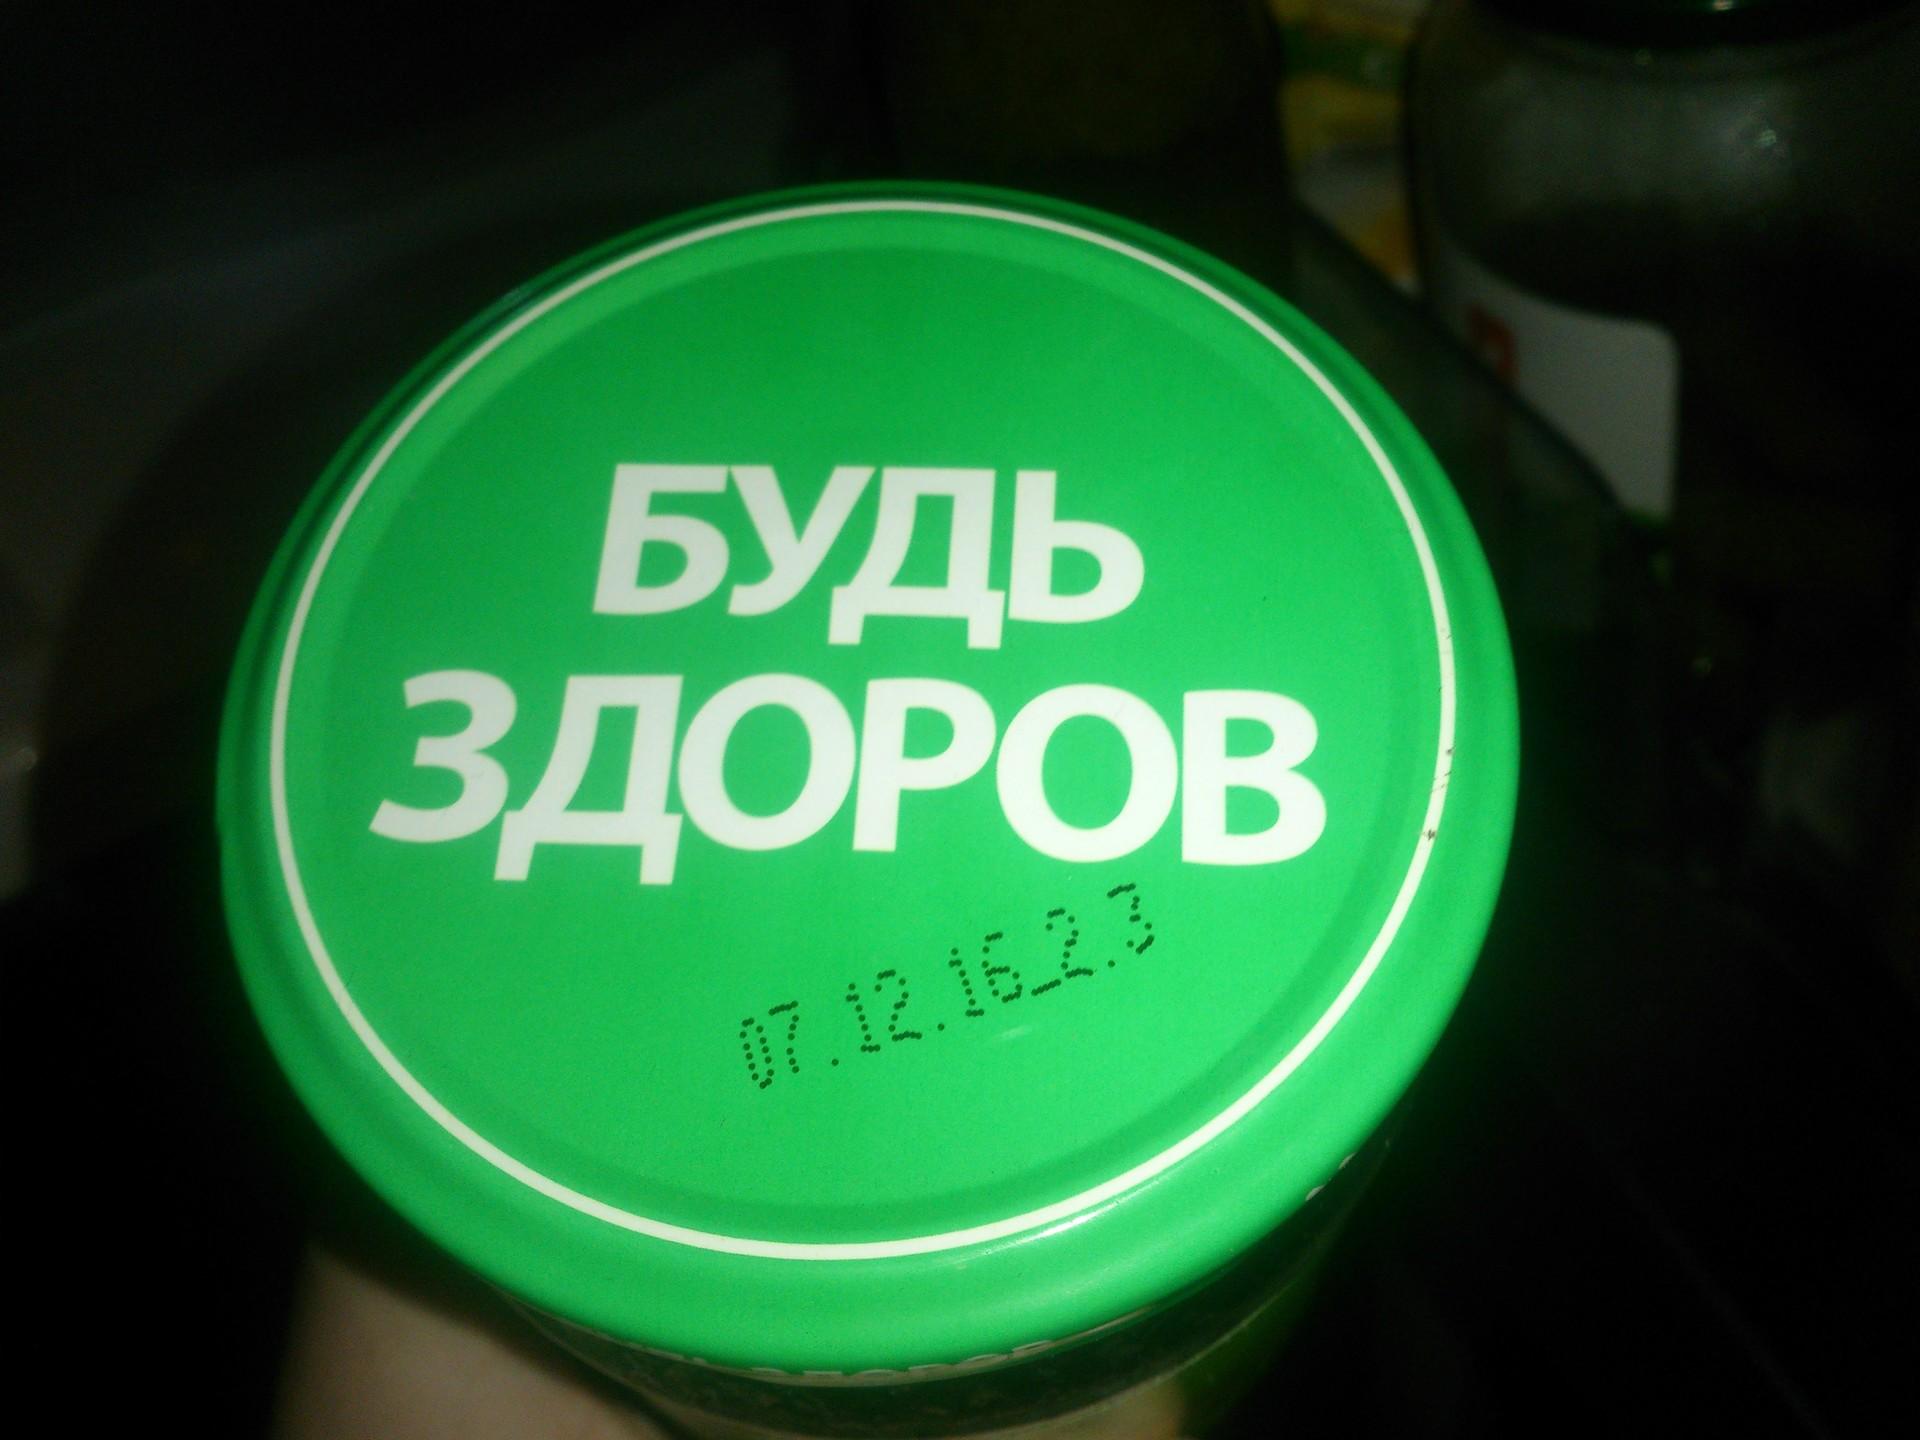 Belaruski shop